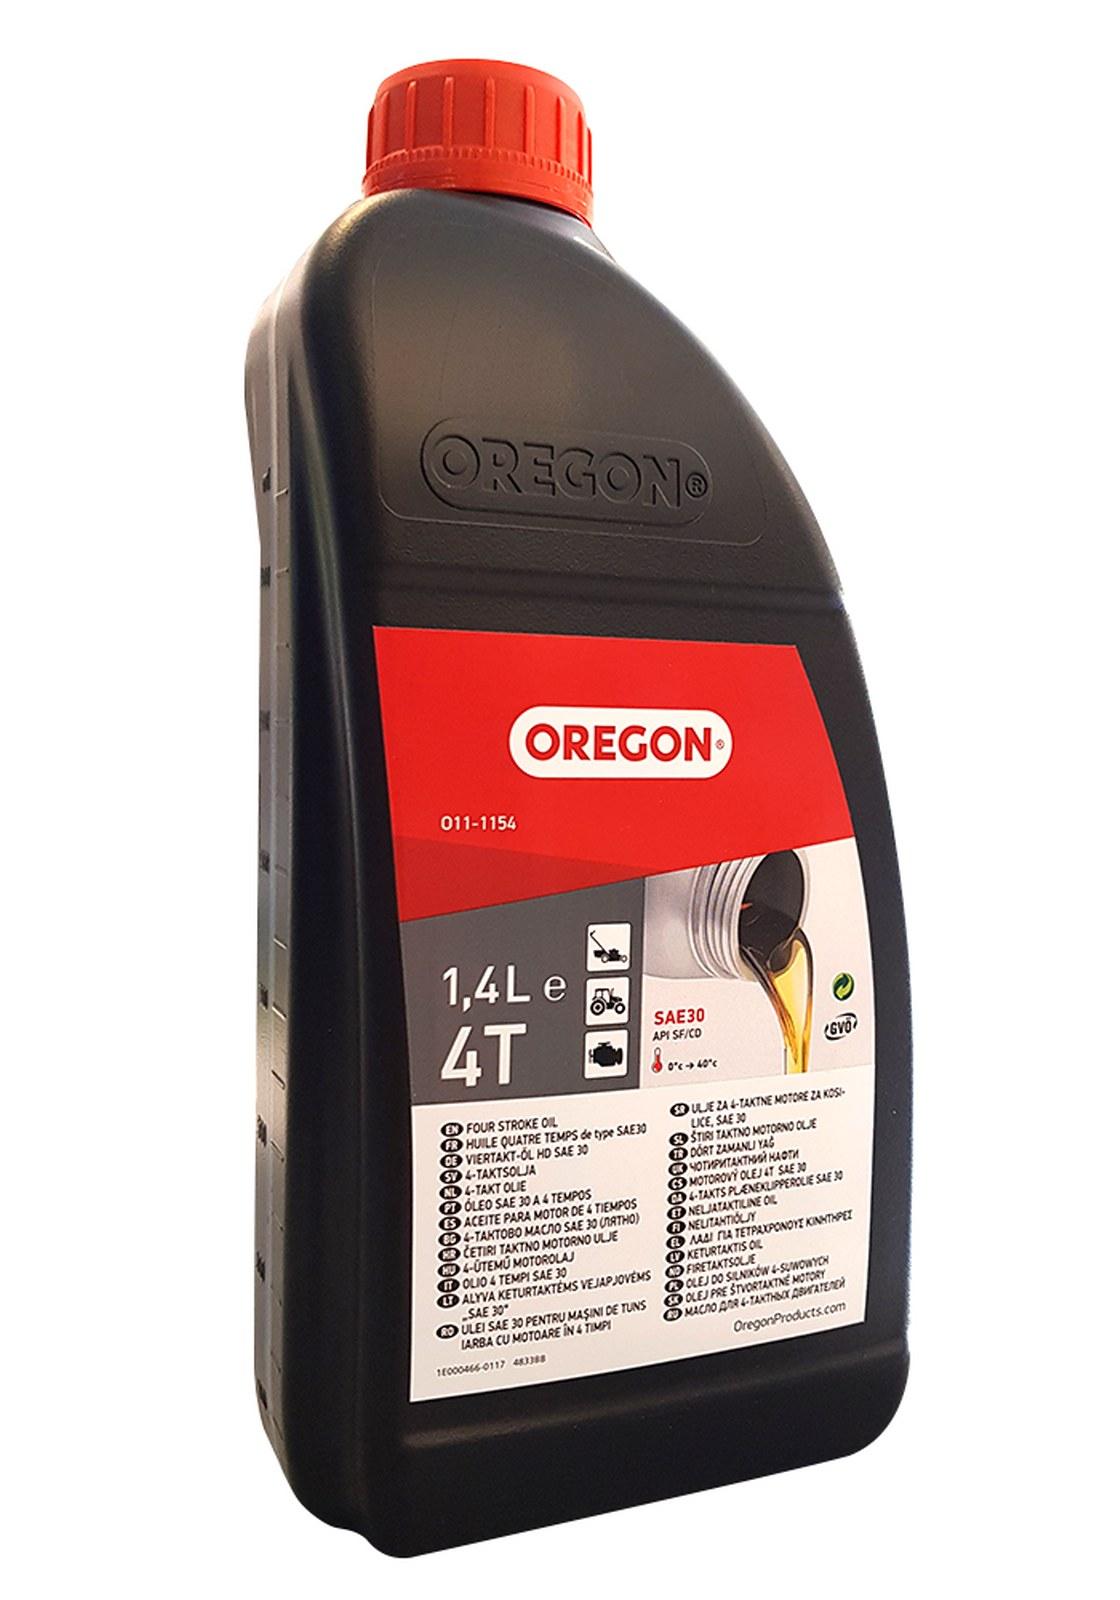 Ulei motor 4 T Oregon 1,4 litri